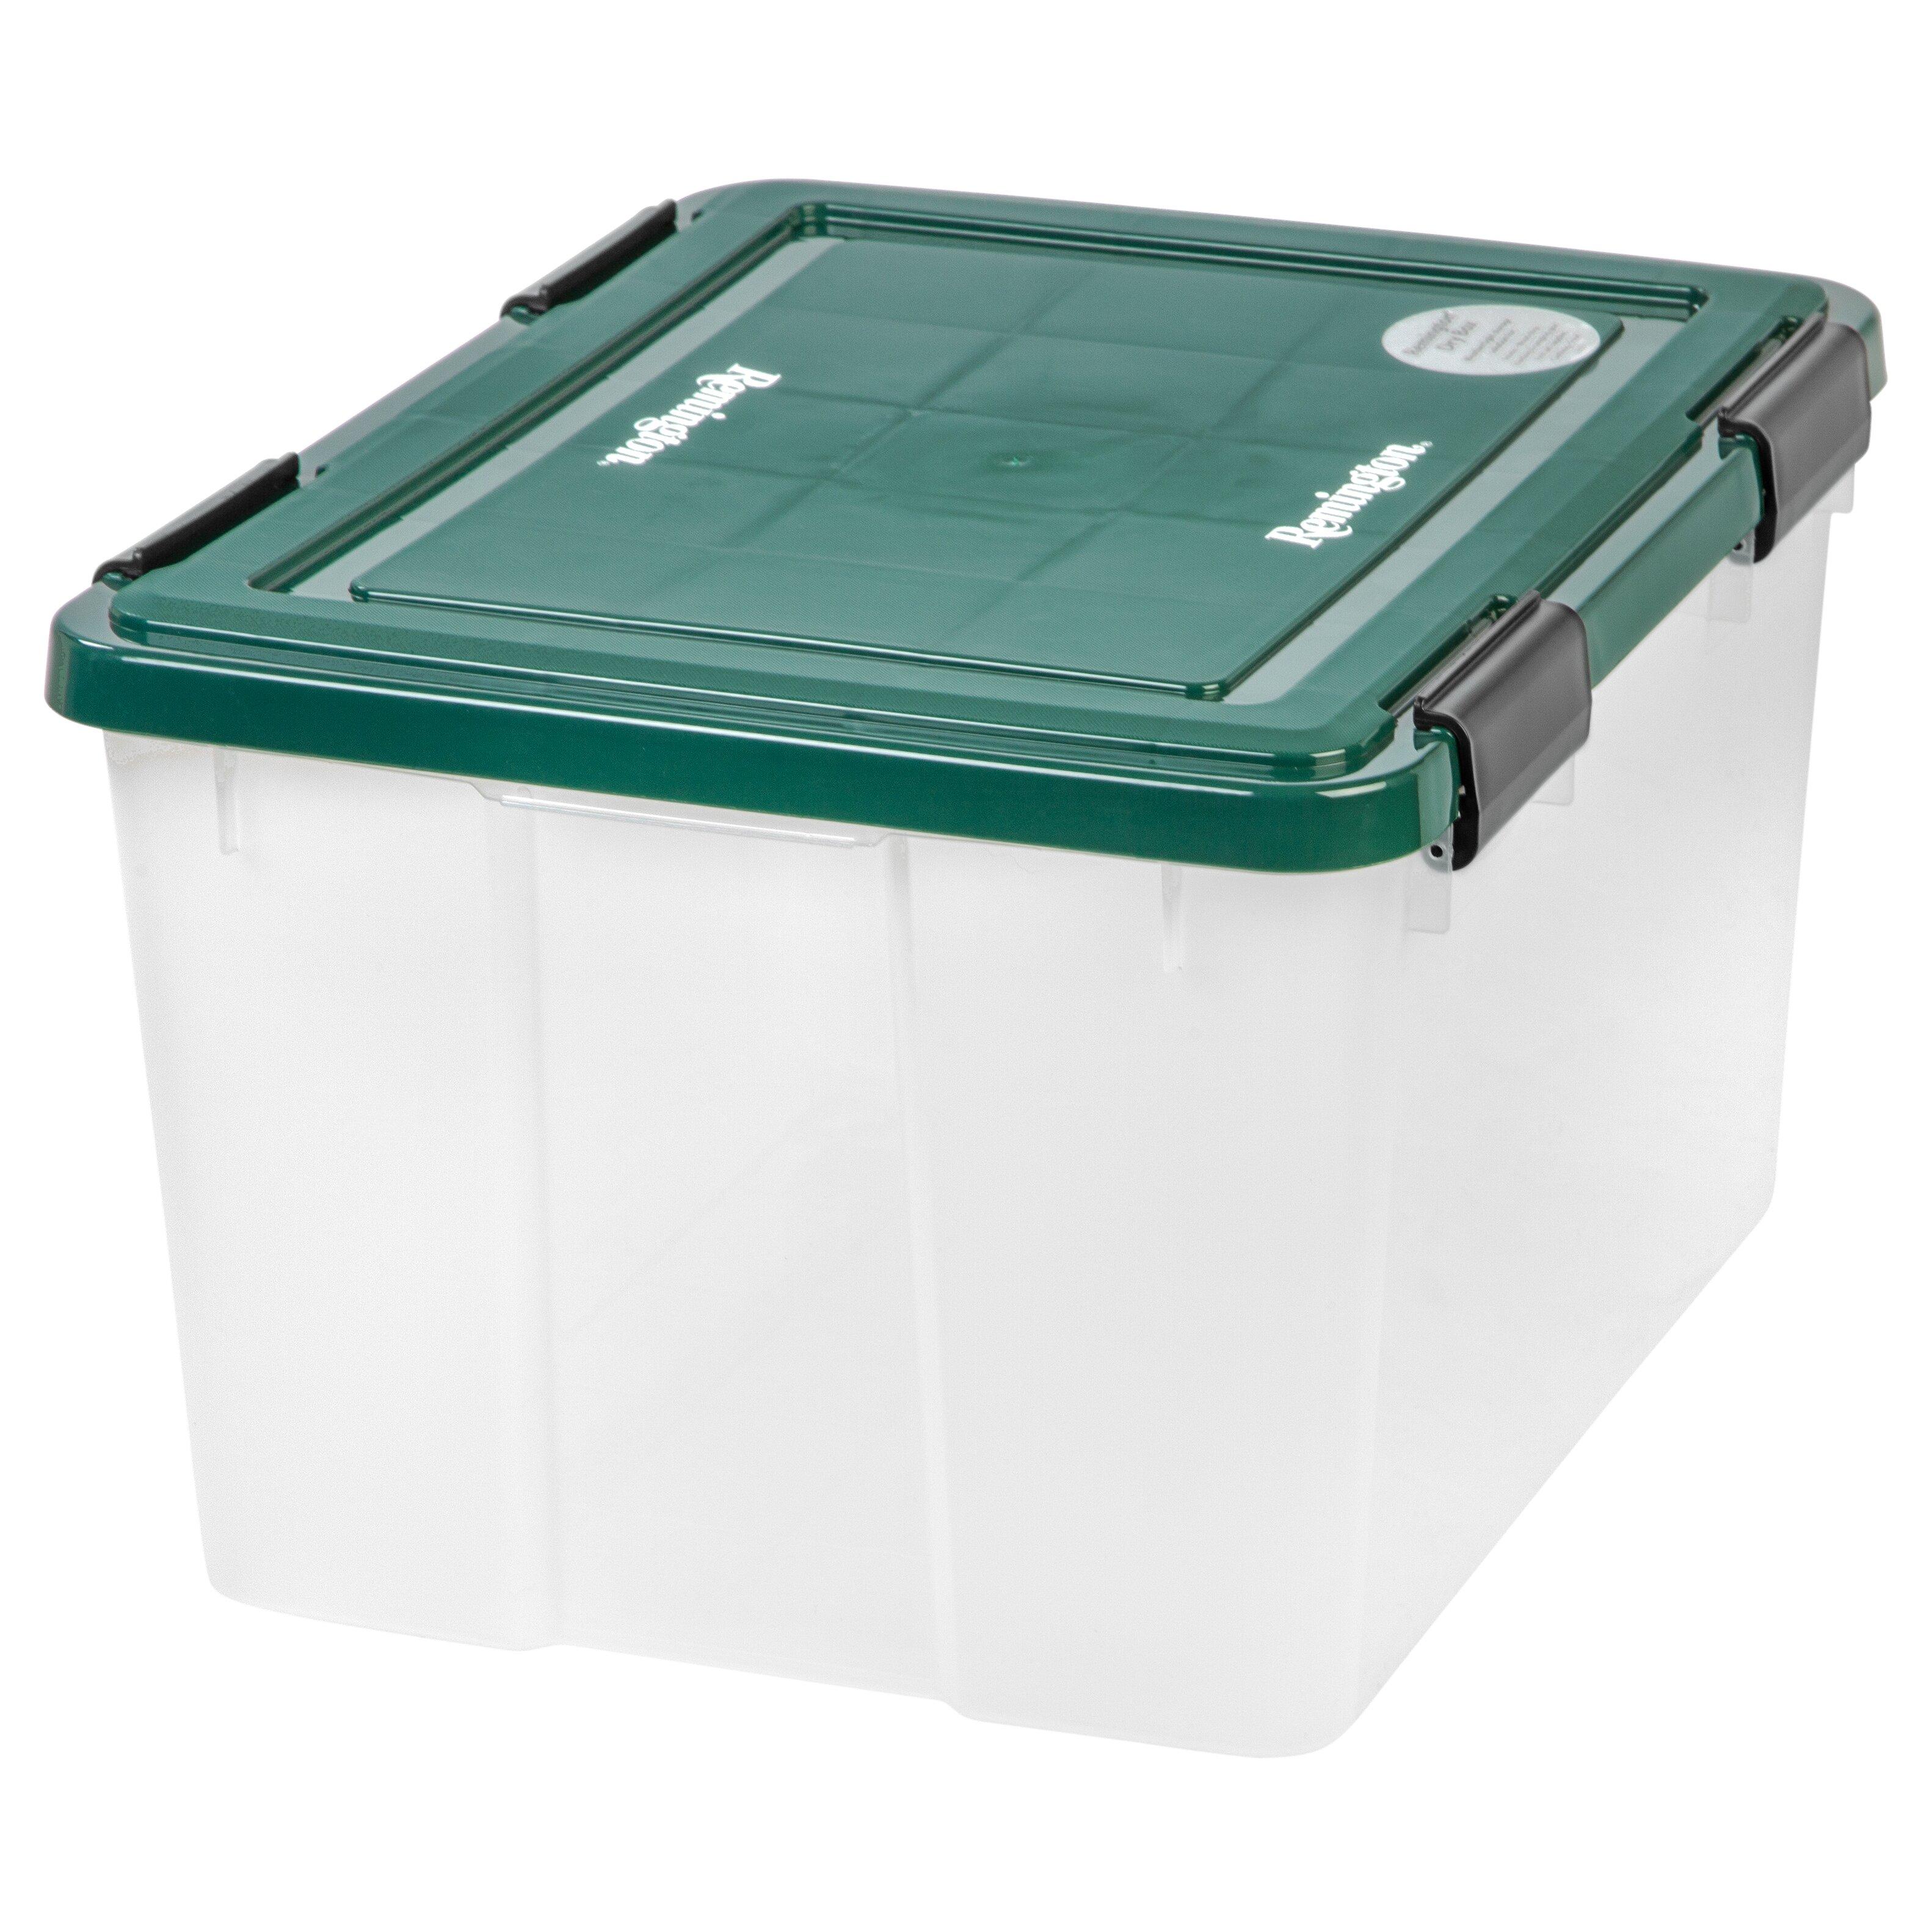 IRIS Remington Weathertight Storage Box | Wayfair